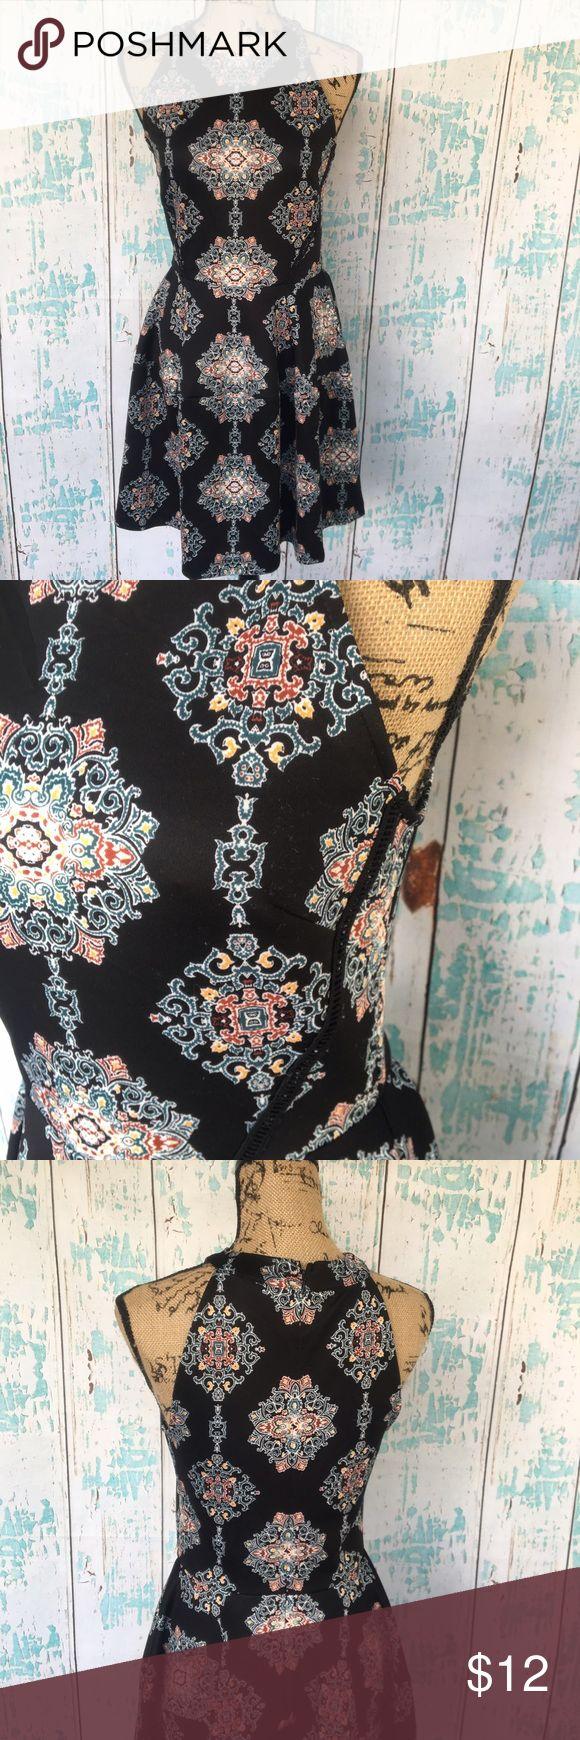 Mossimo dress size small Mossimo dress size small Mossimo Supply Co. Dresses Mini